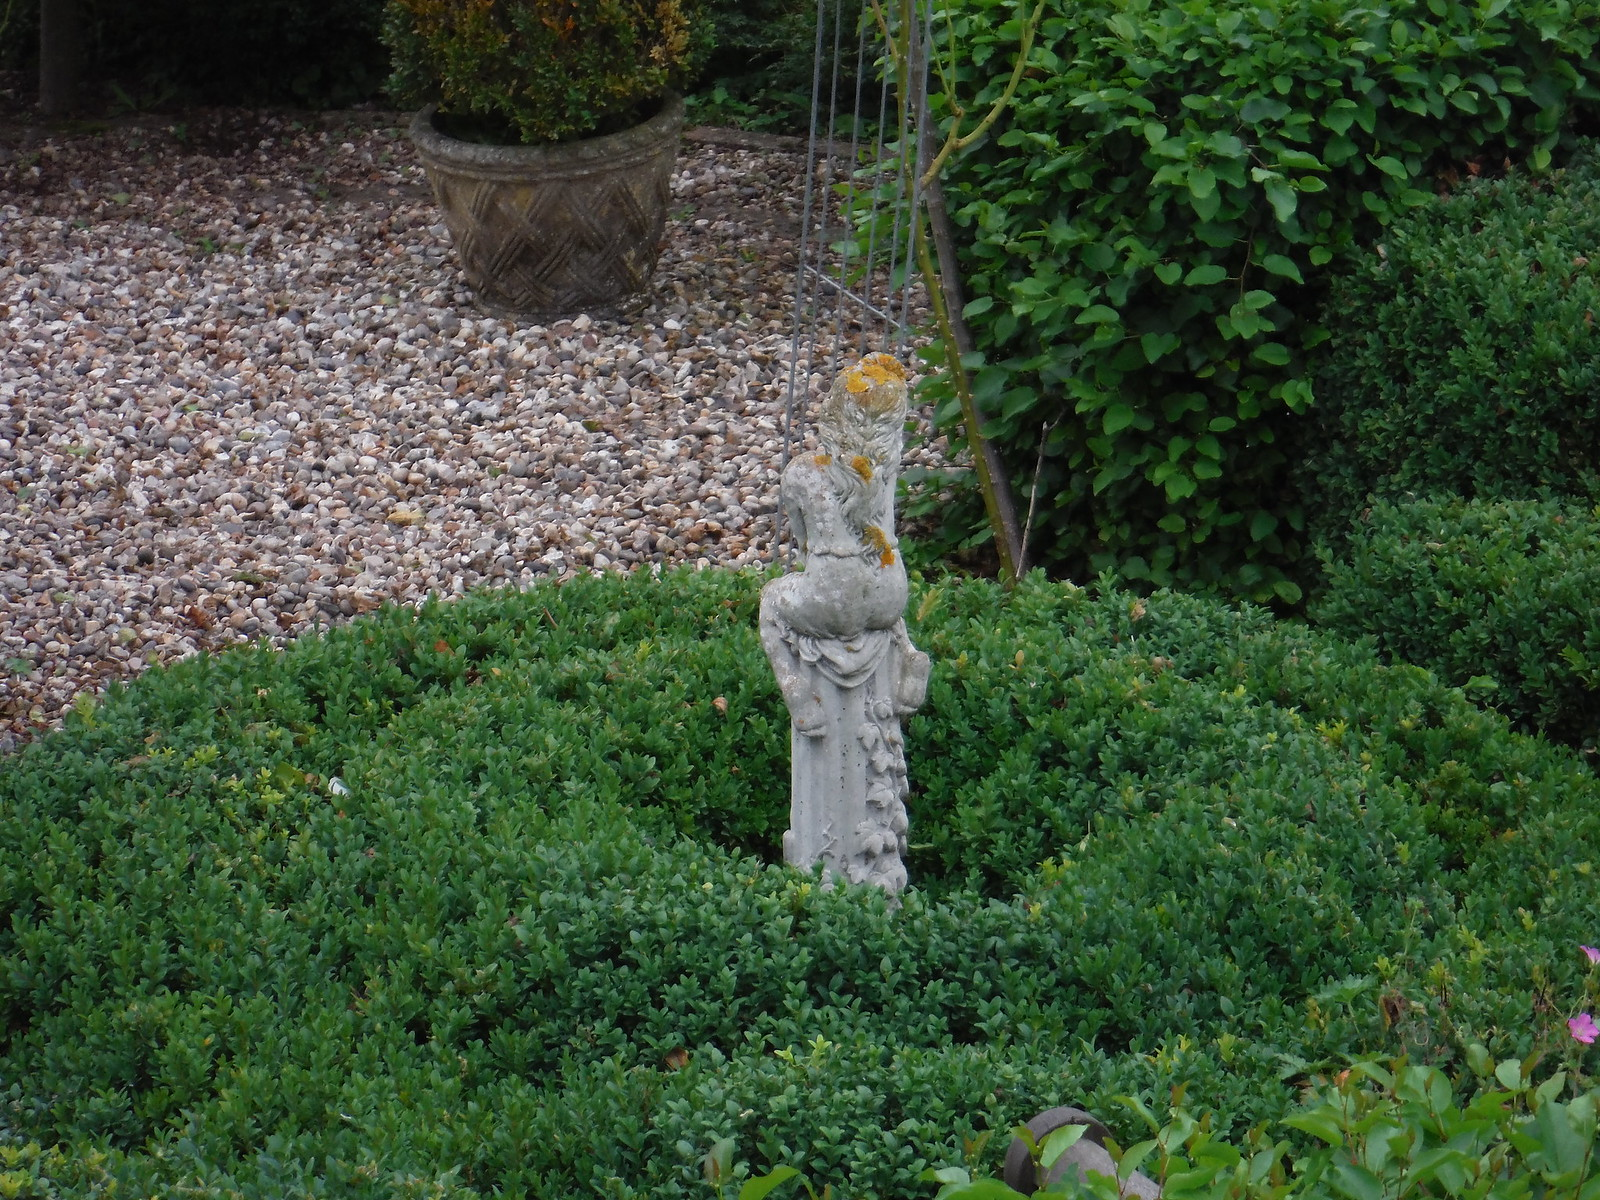 Garden Sculpture (Chandler's Lane) SWC Walk 164 Roydon to Sawbridgeworth via Henry Moore Foundation